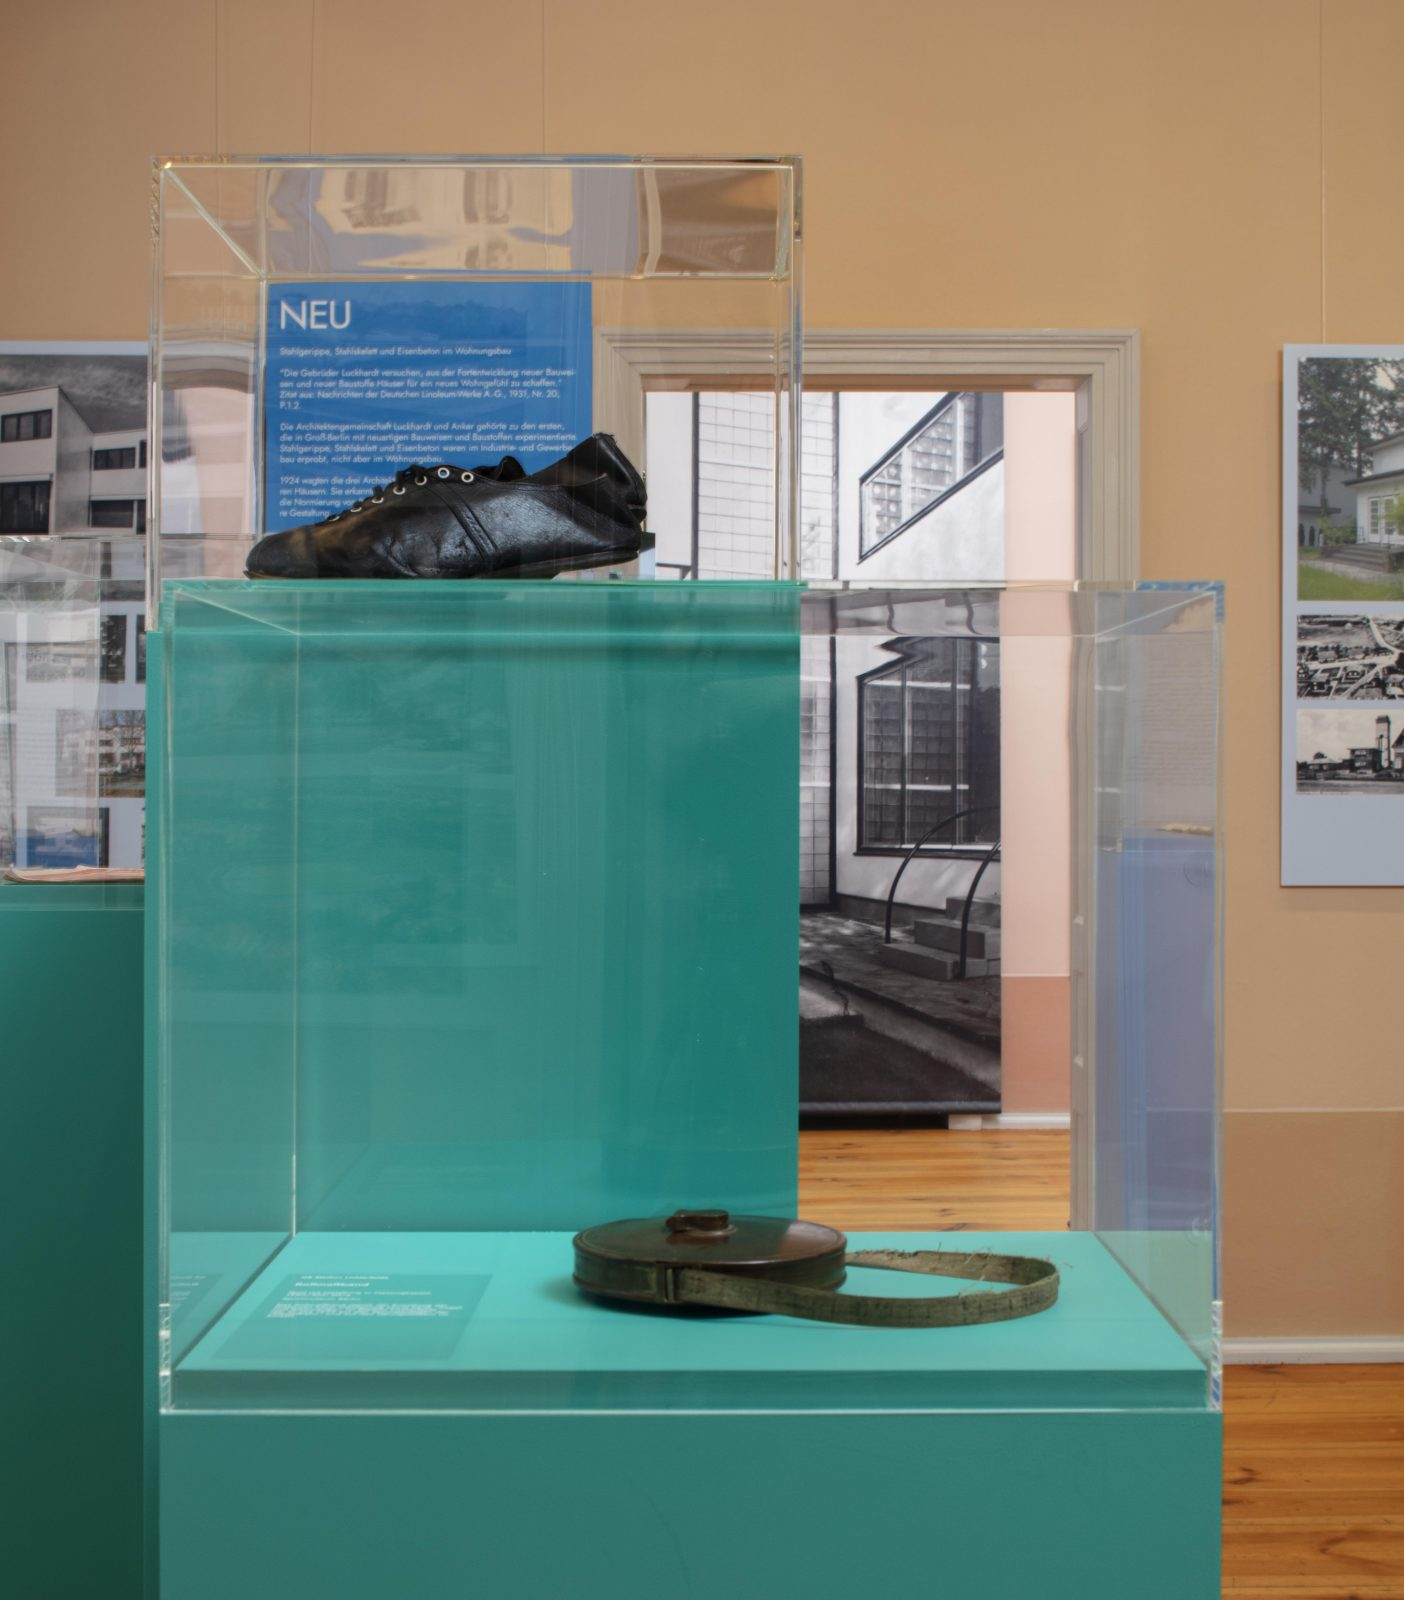 Blick in die Ausstellung NEU GROSS GRÜN, Team Best 2020